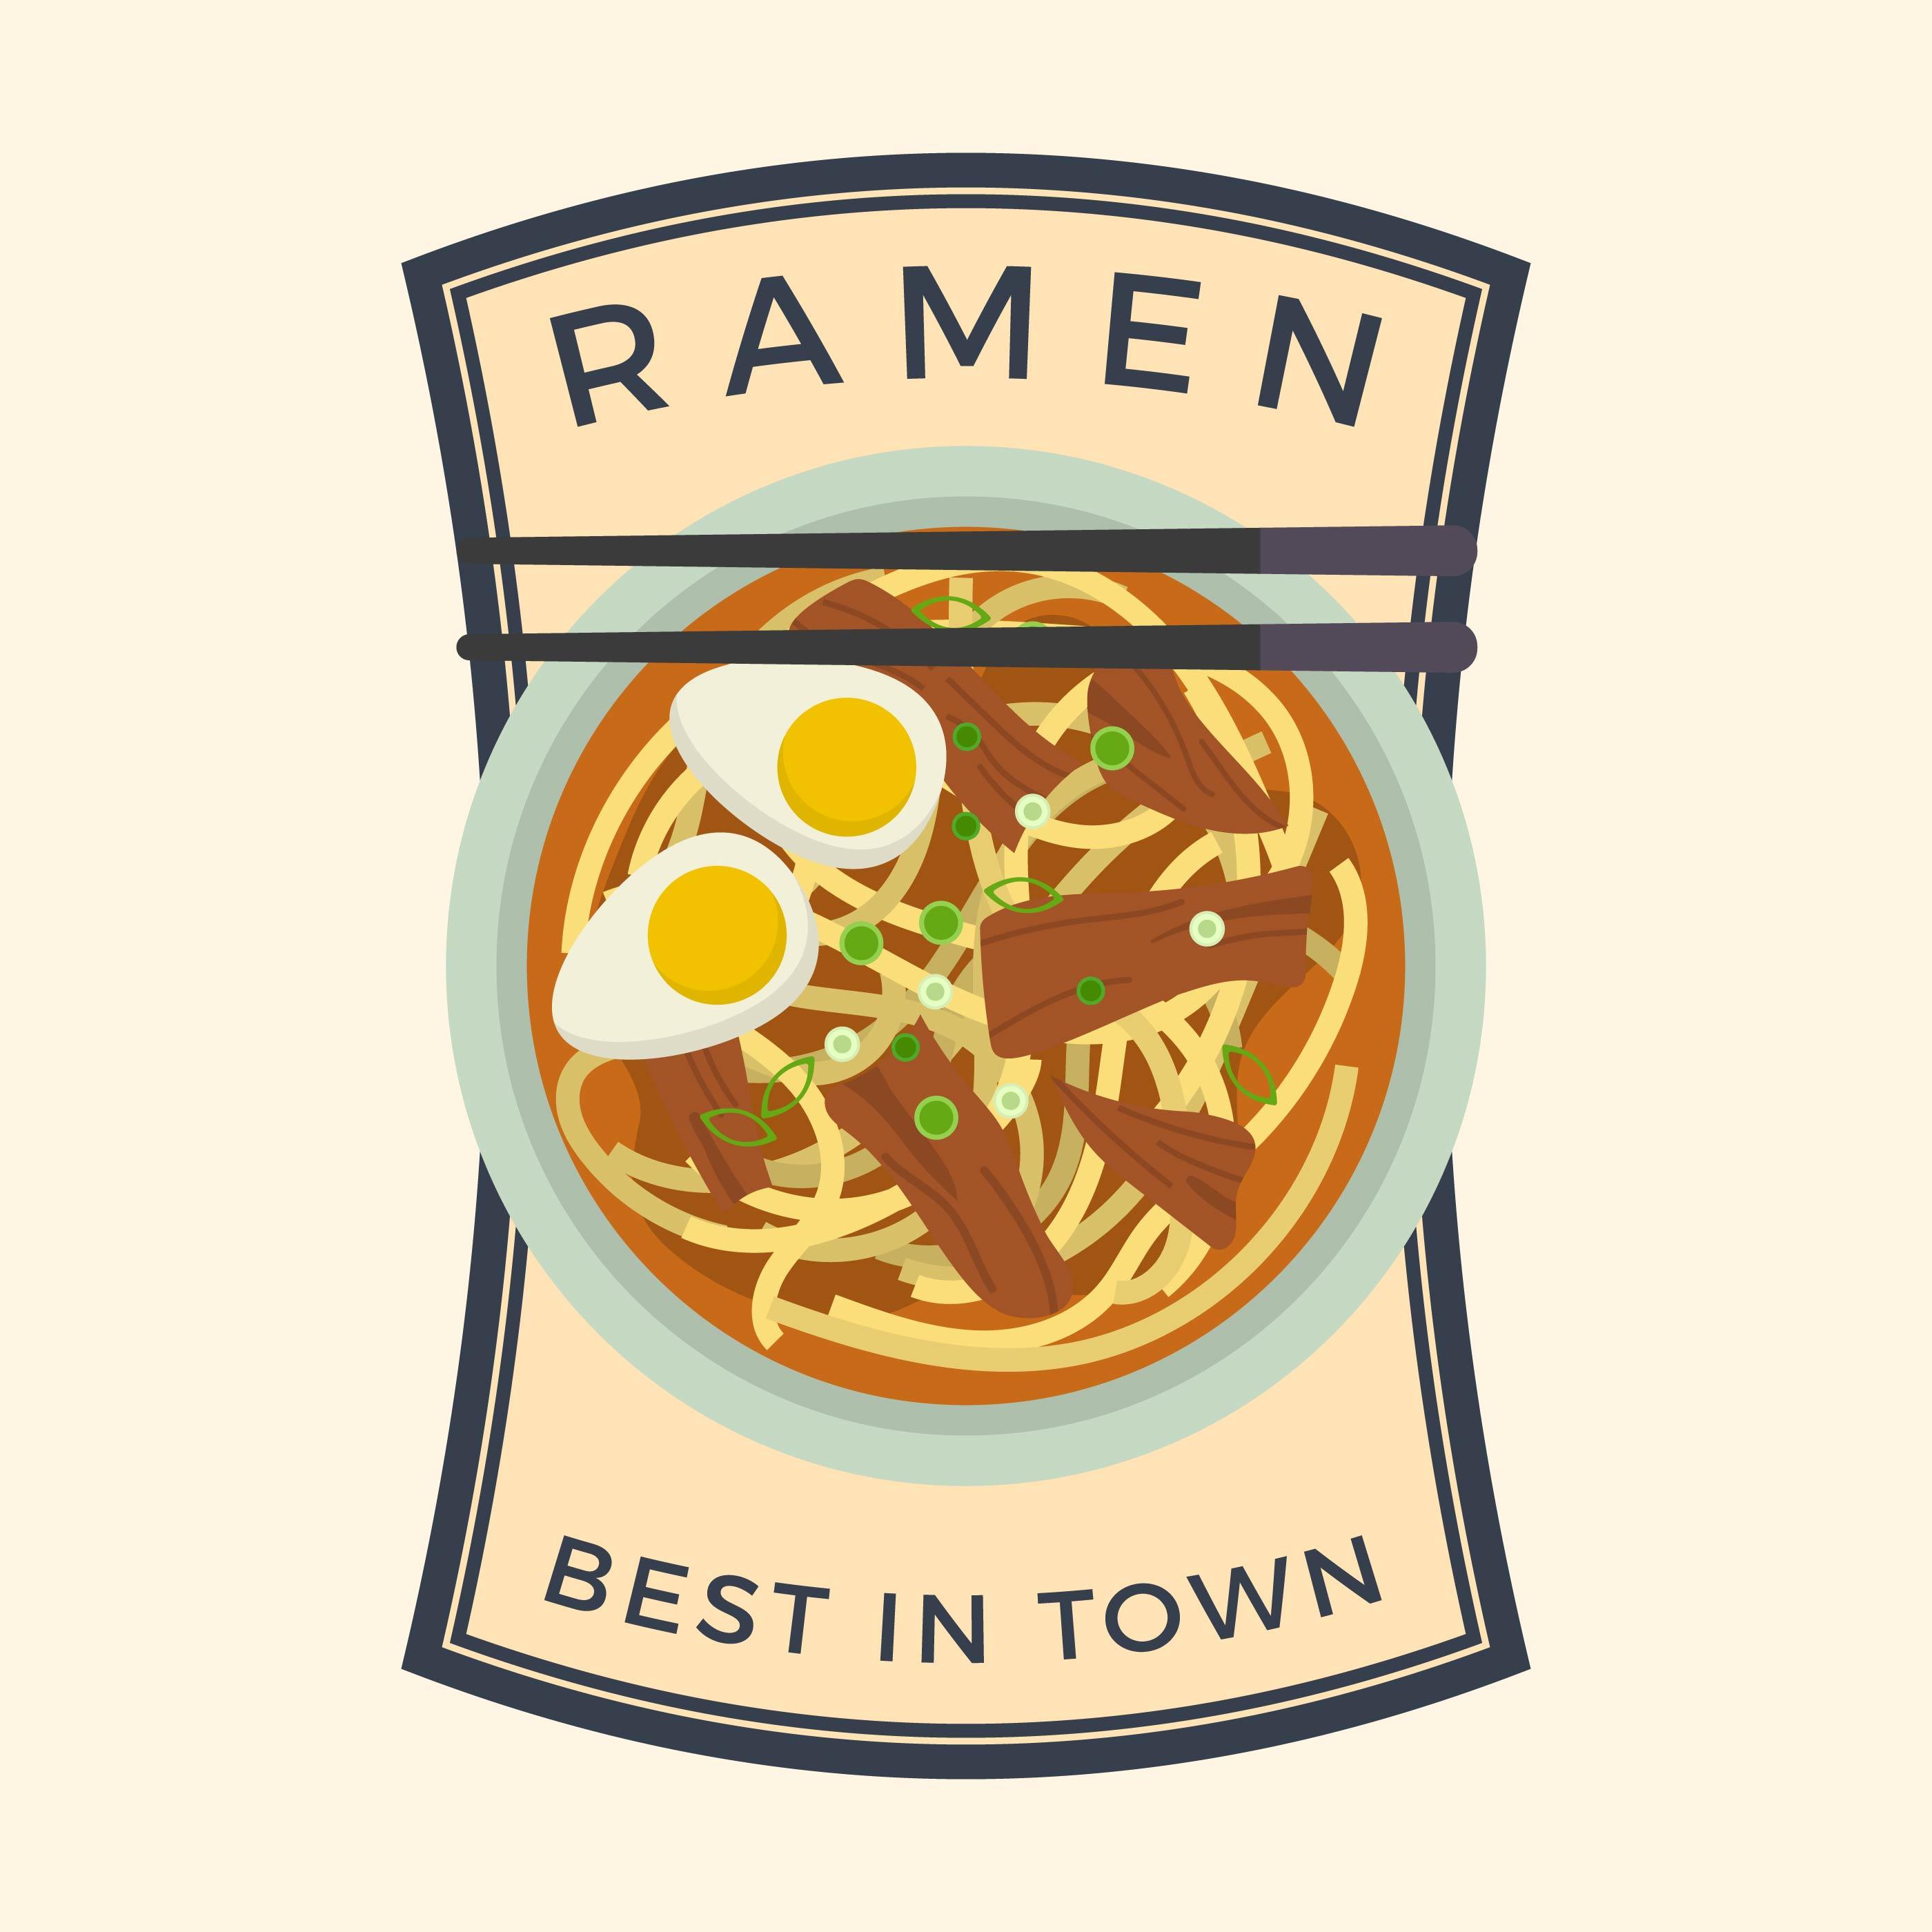 flat ramen badge vector illustration - download free vector art